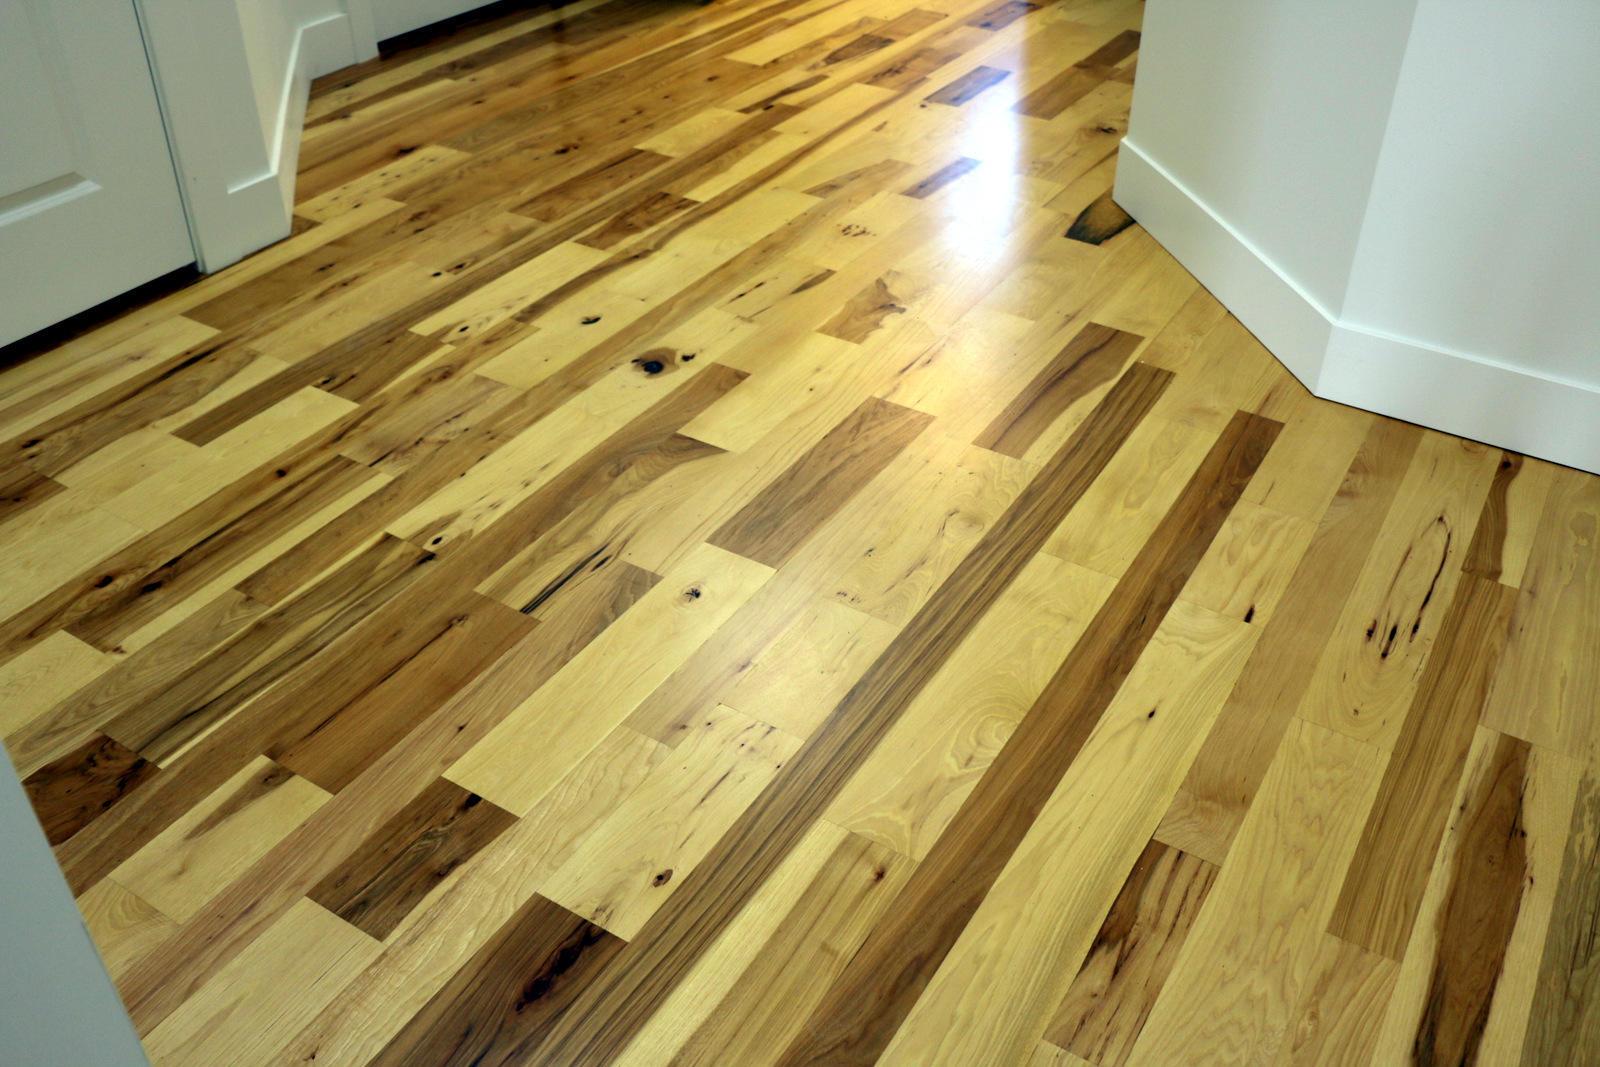 Practical Renovations Wood floors image 1